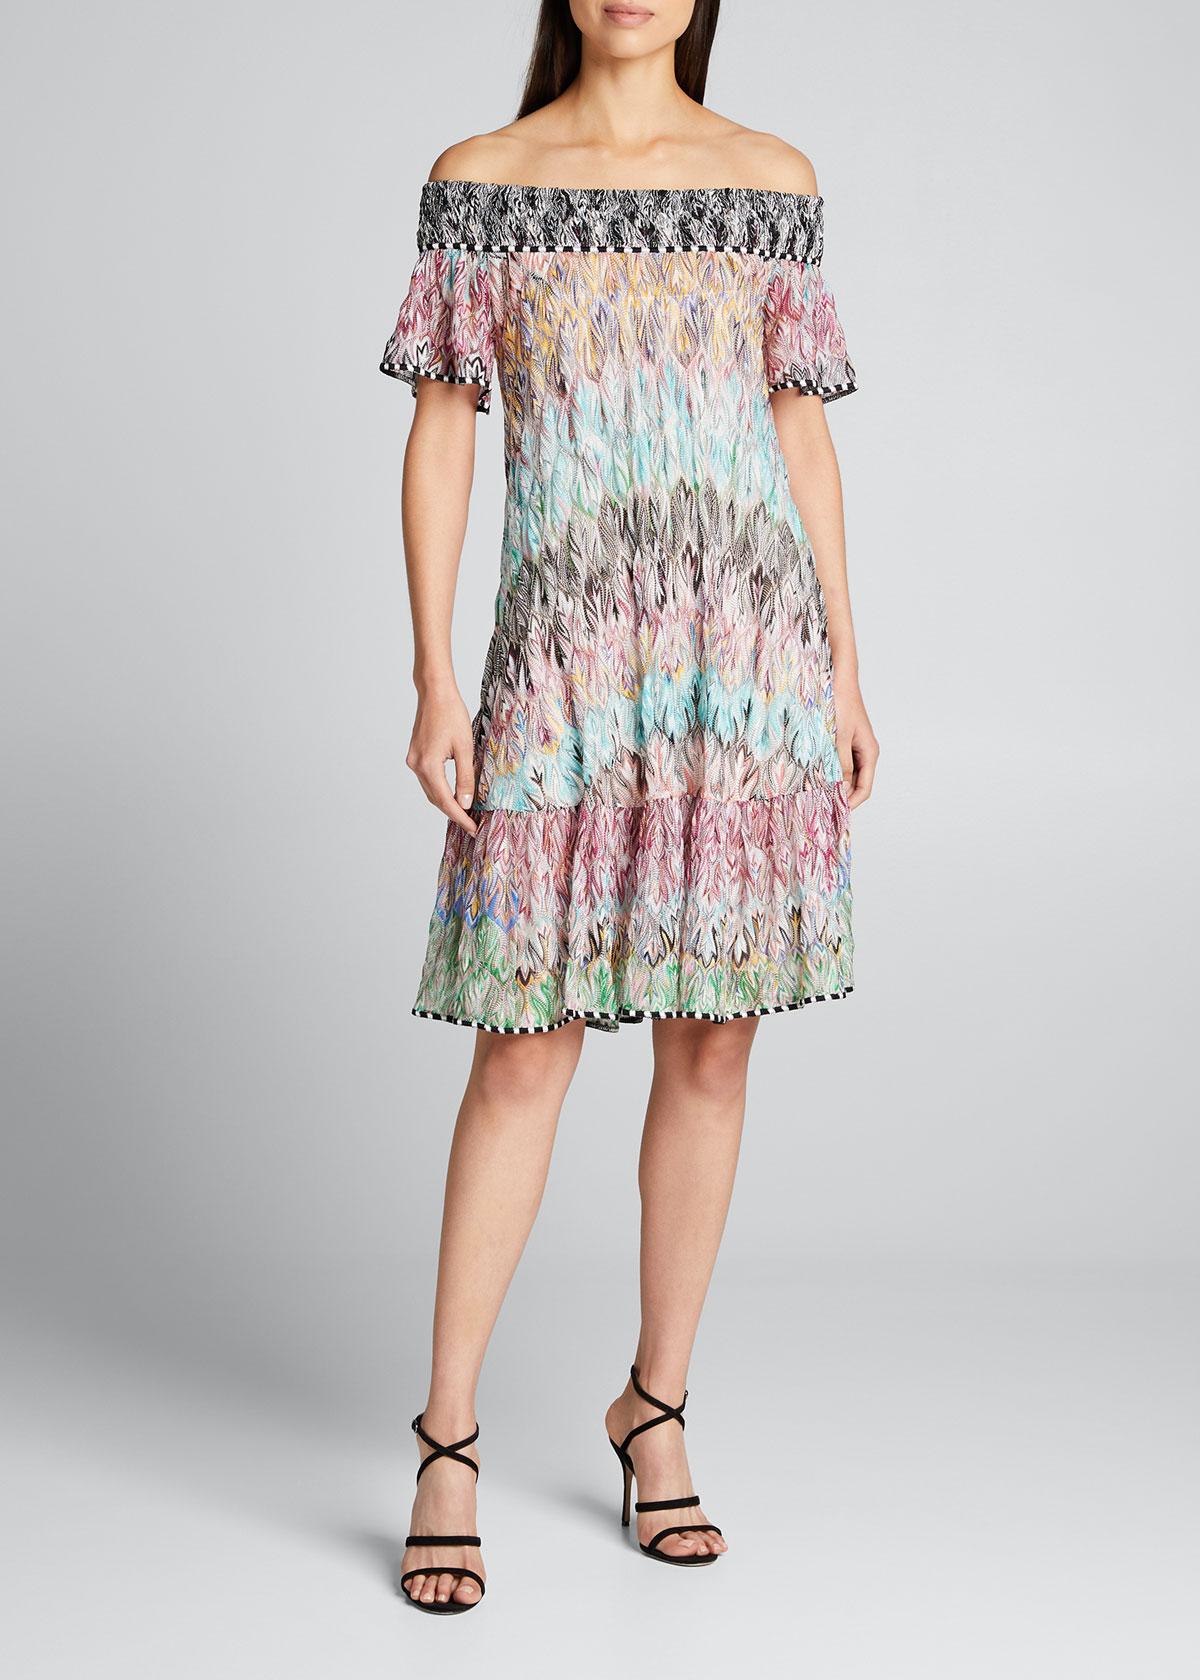 Missoni Dresses OFF-THE-SHOULDER PRINTED A-LINE DRESS